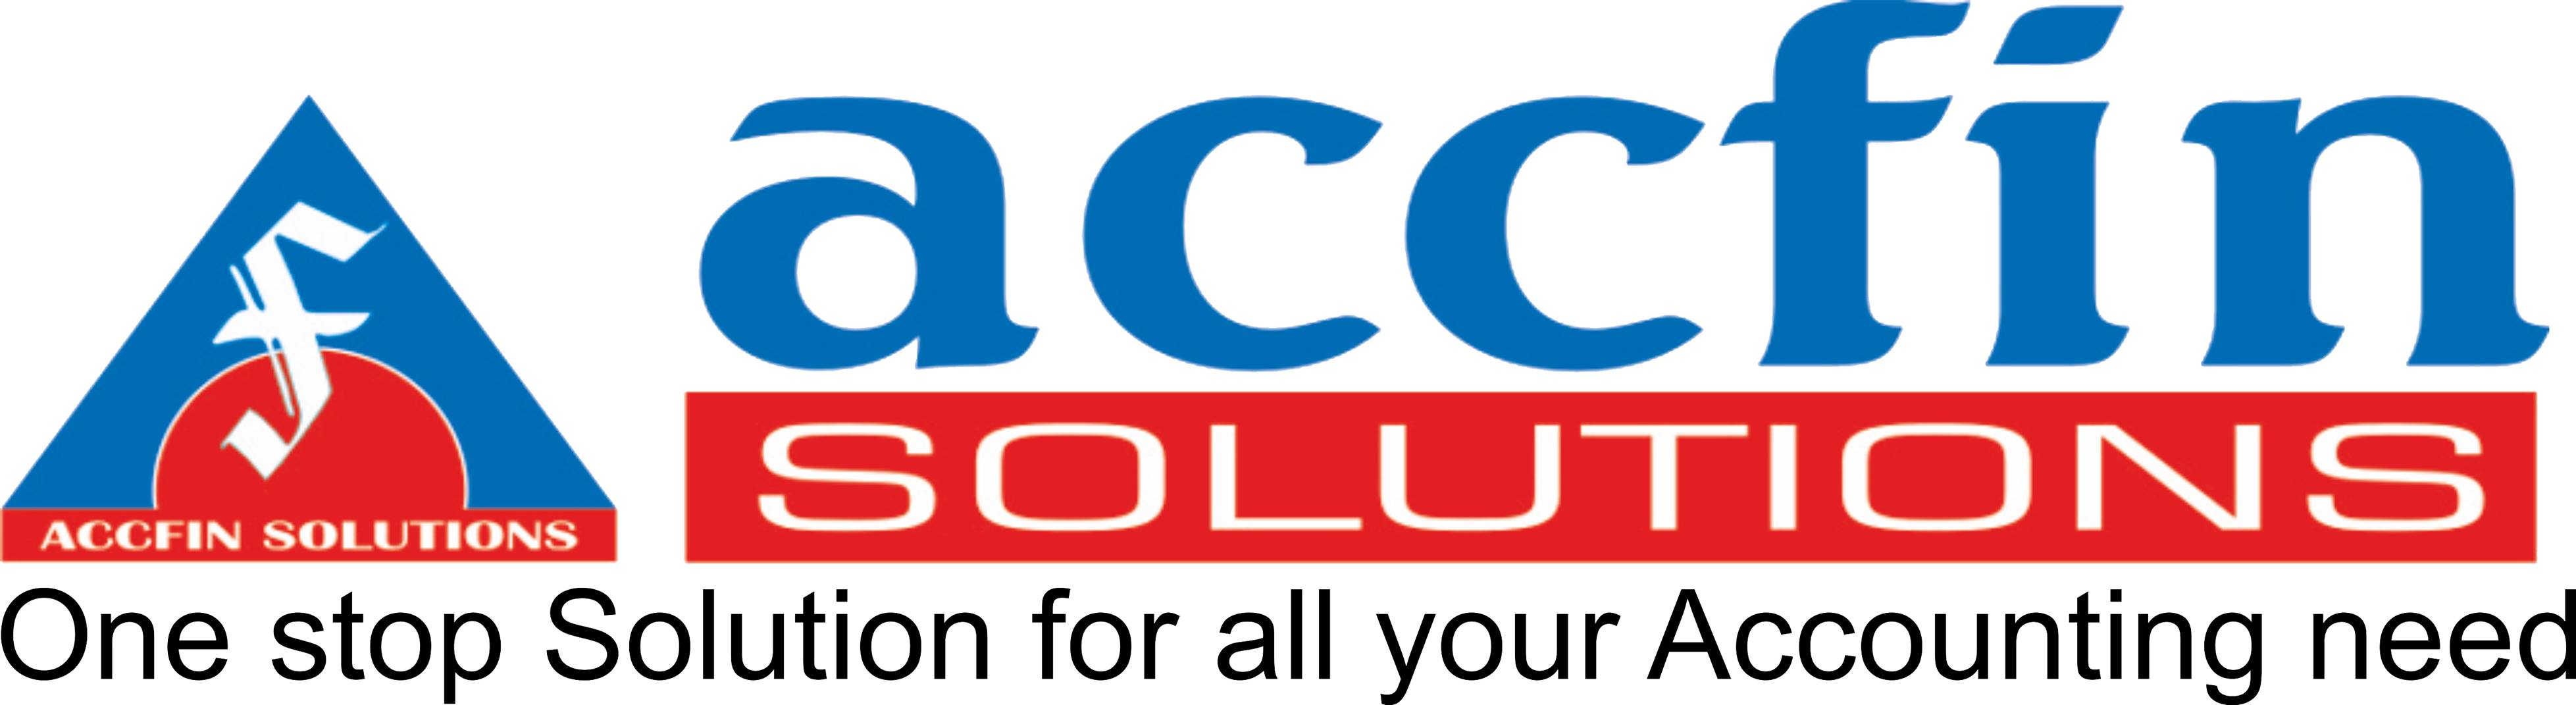 Accfin Solutions - logo